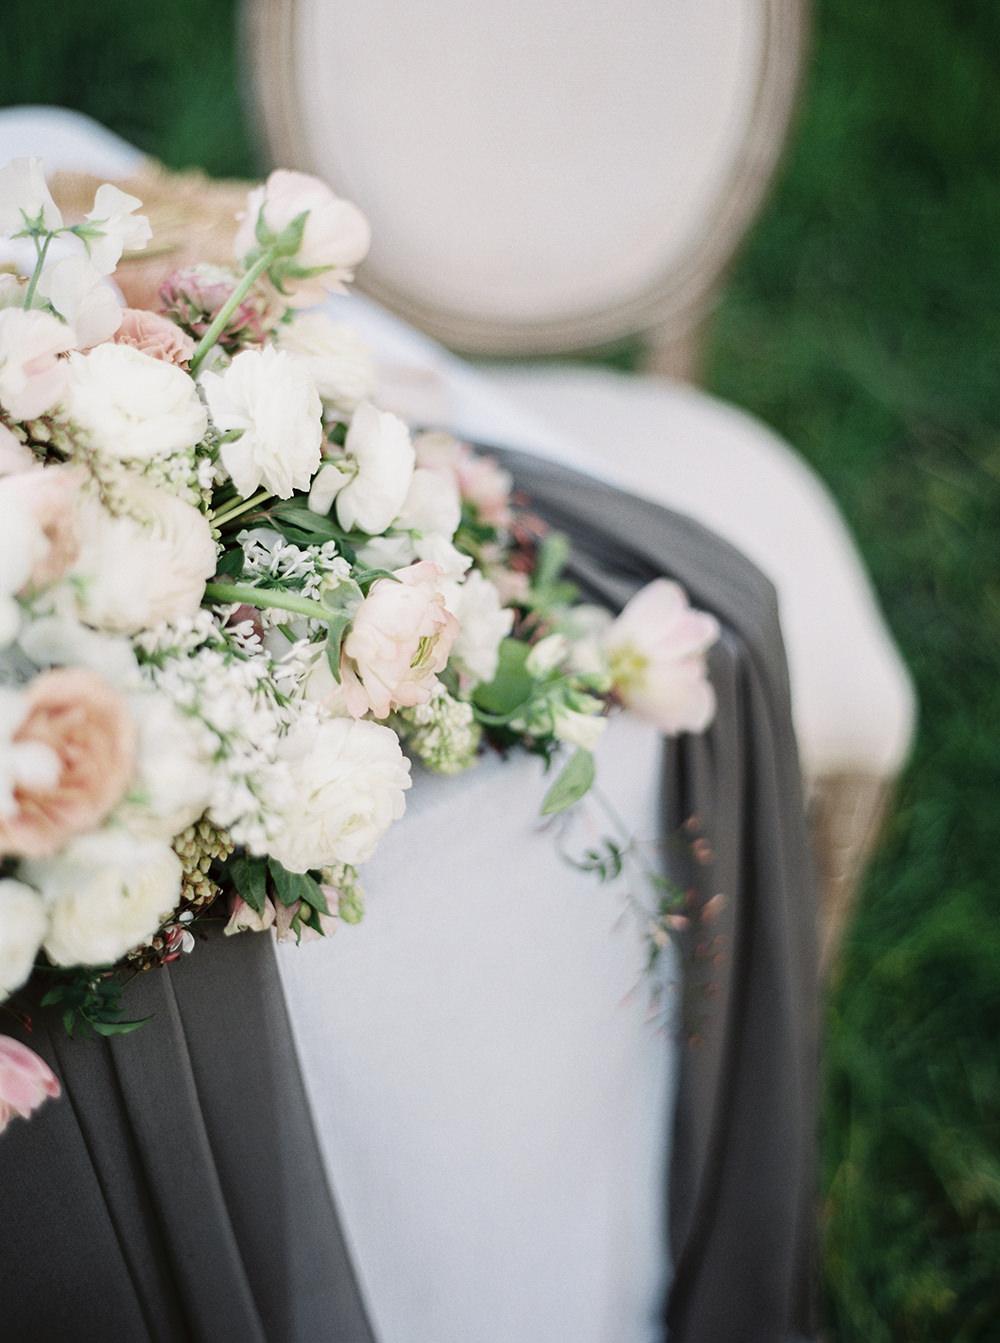 romantic wedding day details - photo by Tyler Rye Photography https://ruffledblog.com/romantic-coastal-california-wedding-inspiration